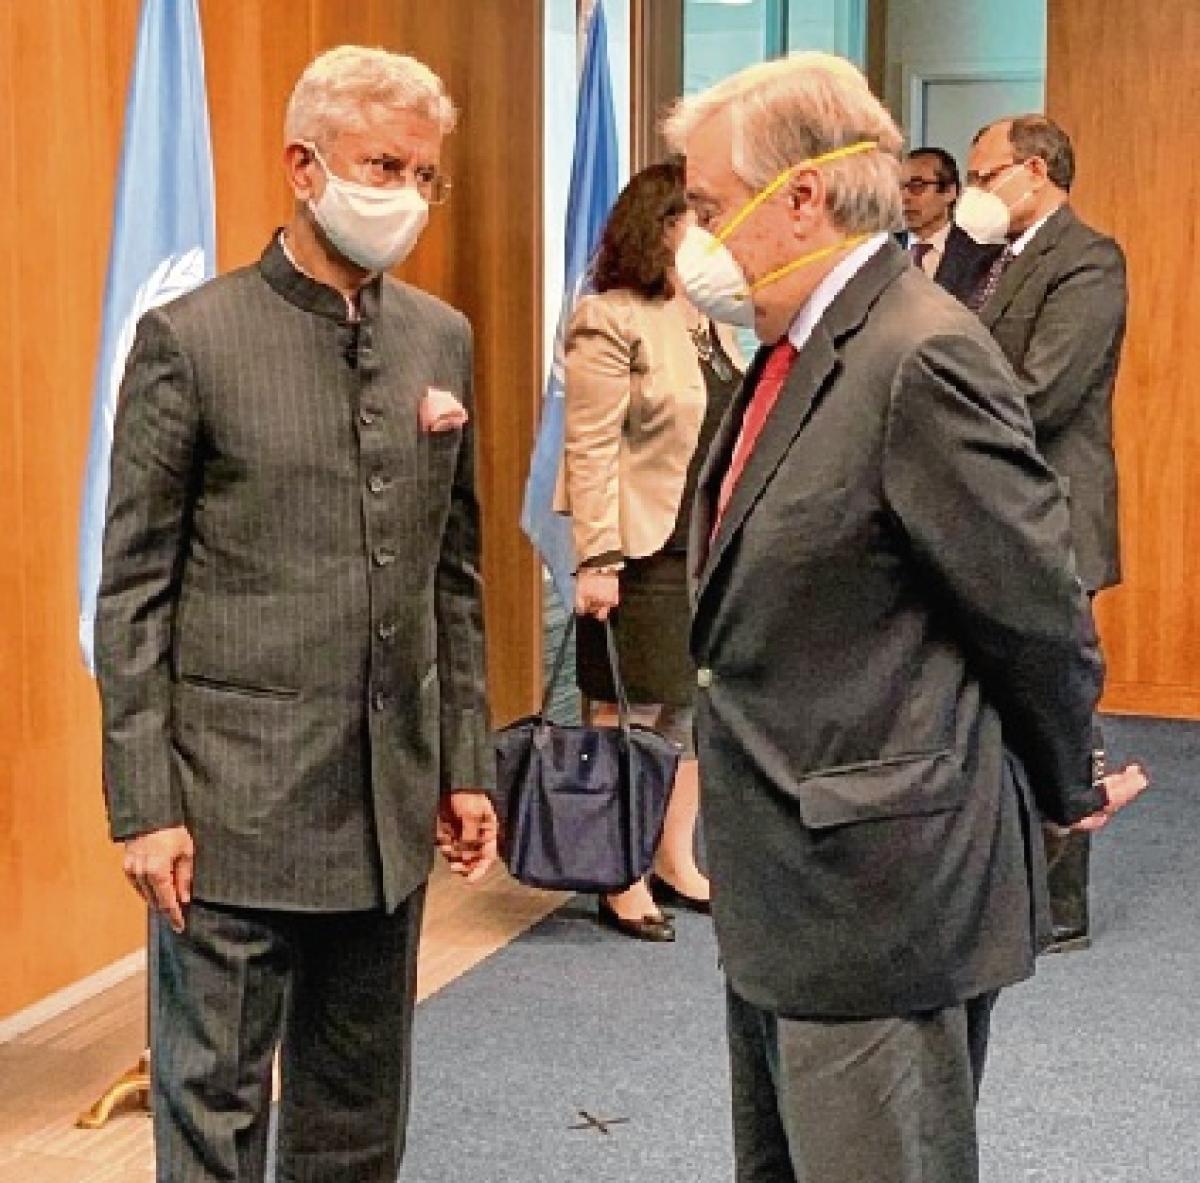 Jaishankar meets Guterres, discusses vaccine solutions